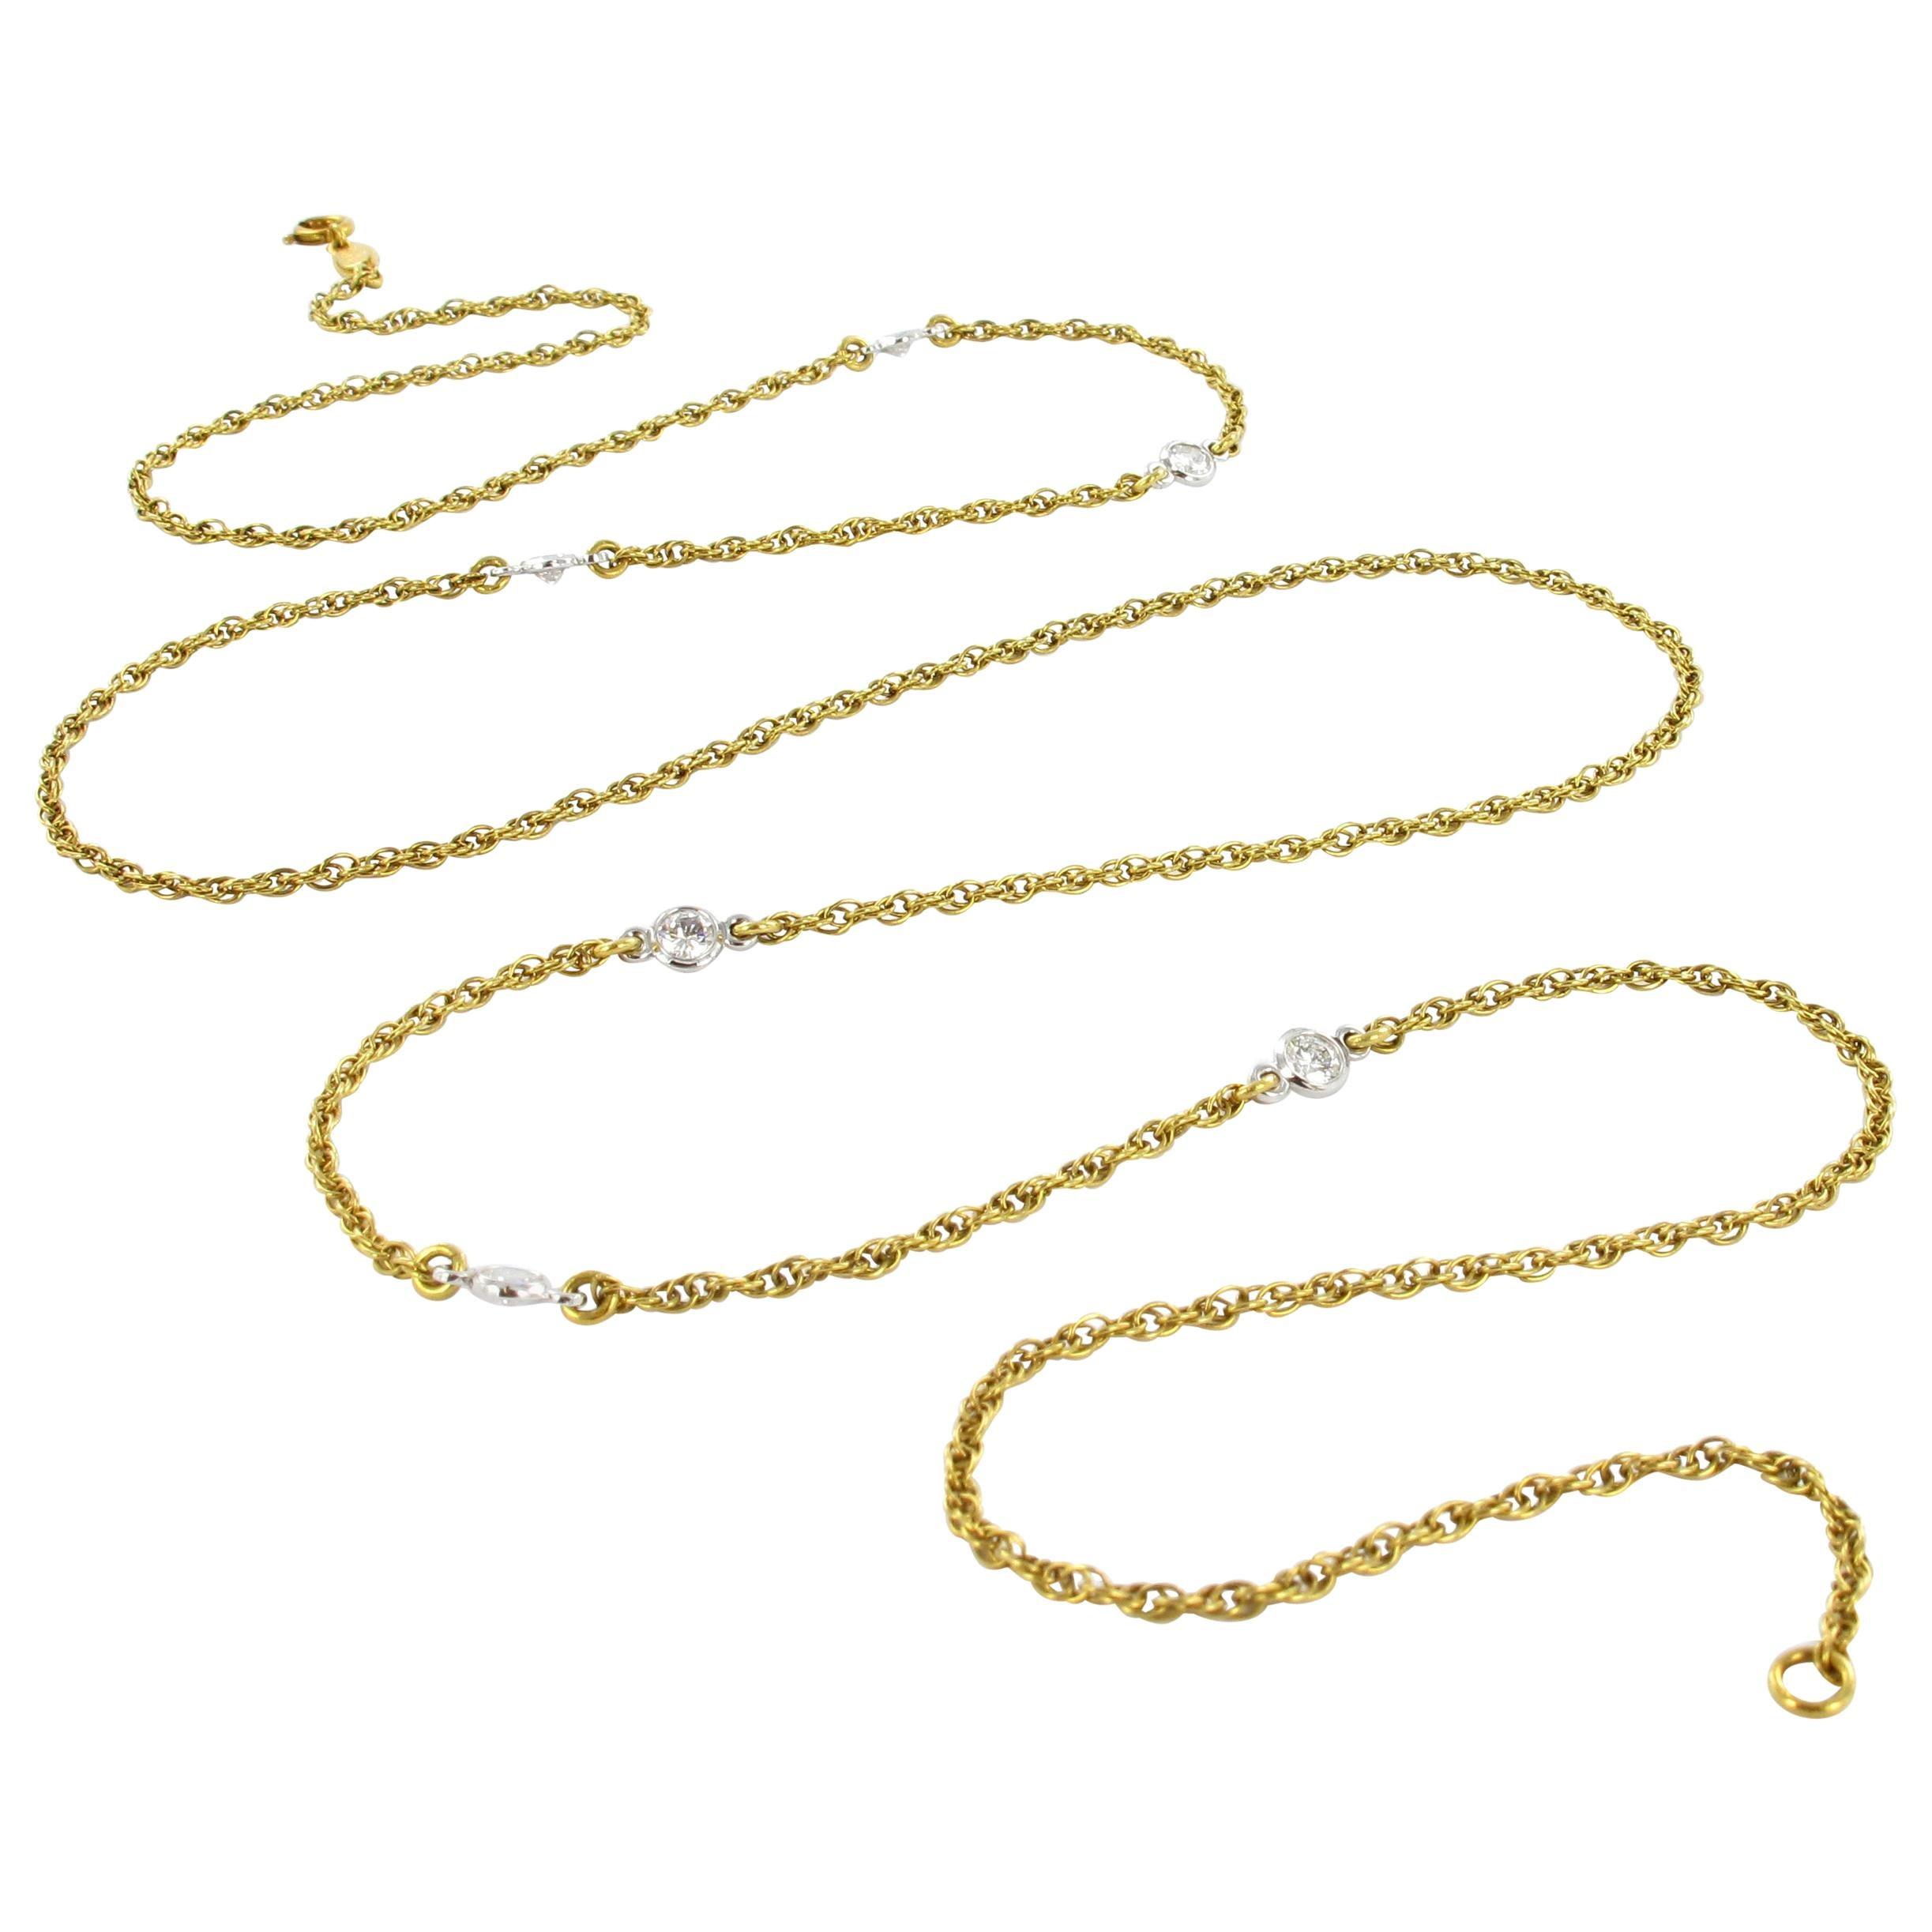 Diamond Sautoir in Yellow and White Gold 750